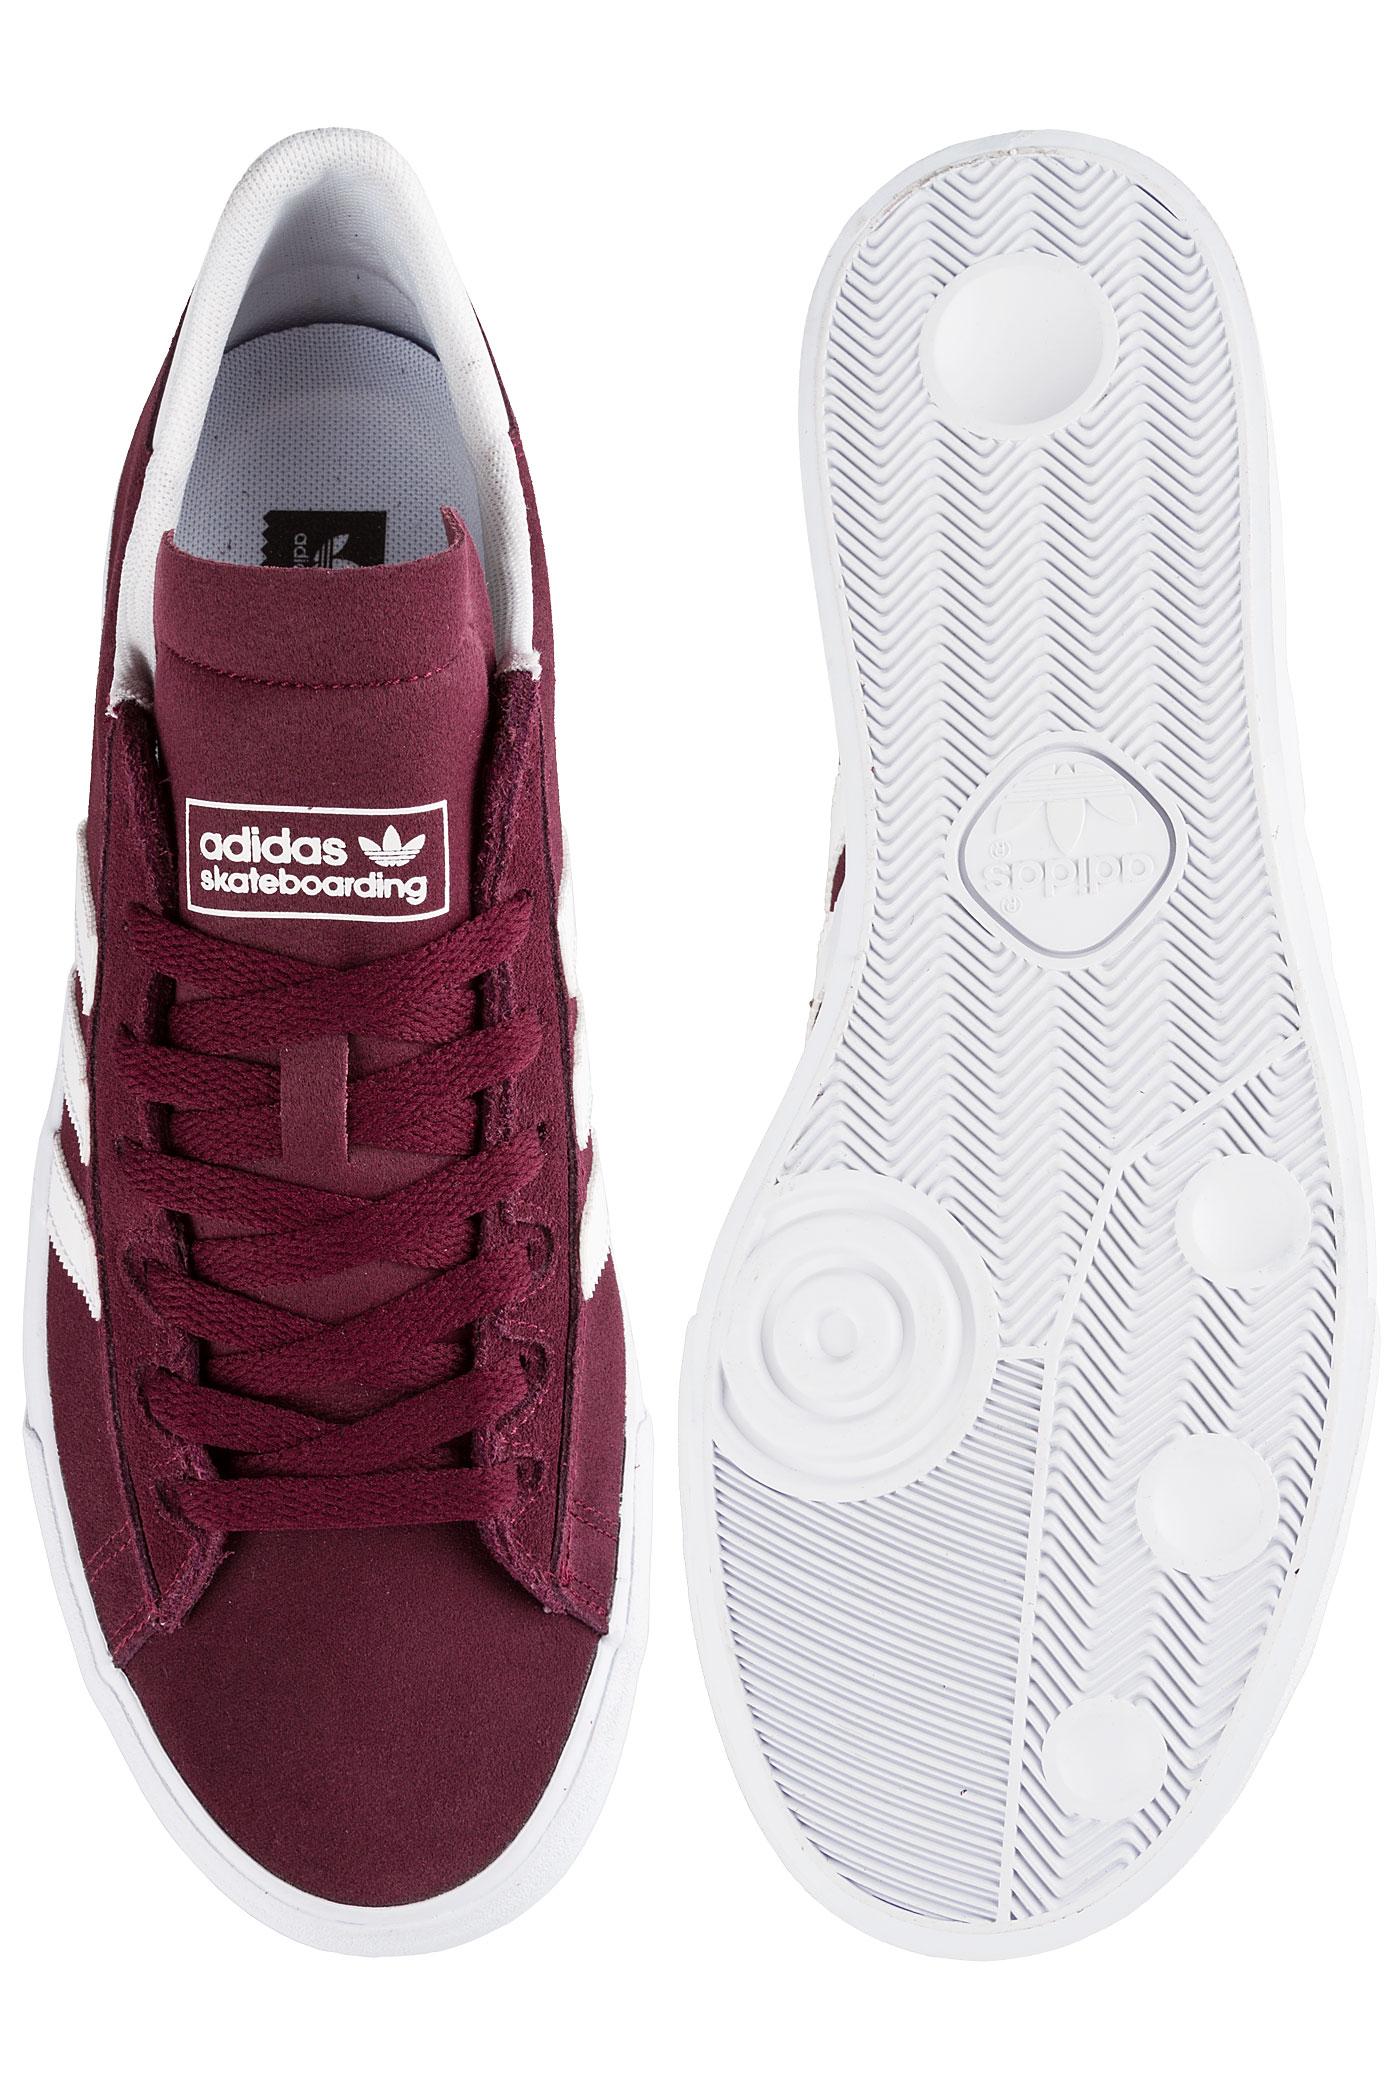 ... adidas Skateboarding Campus Vulc II ADV Shoes (maroon white white) ... 28e60e48d